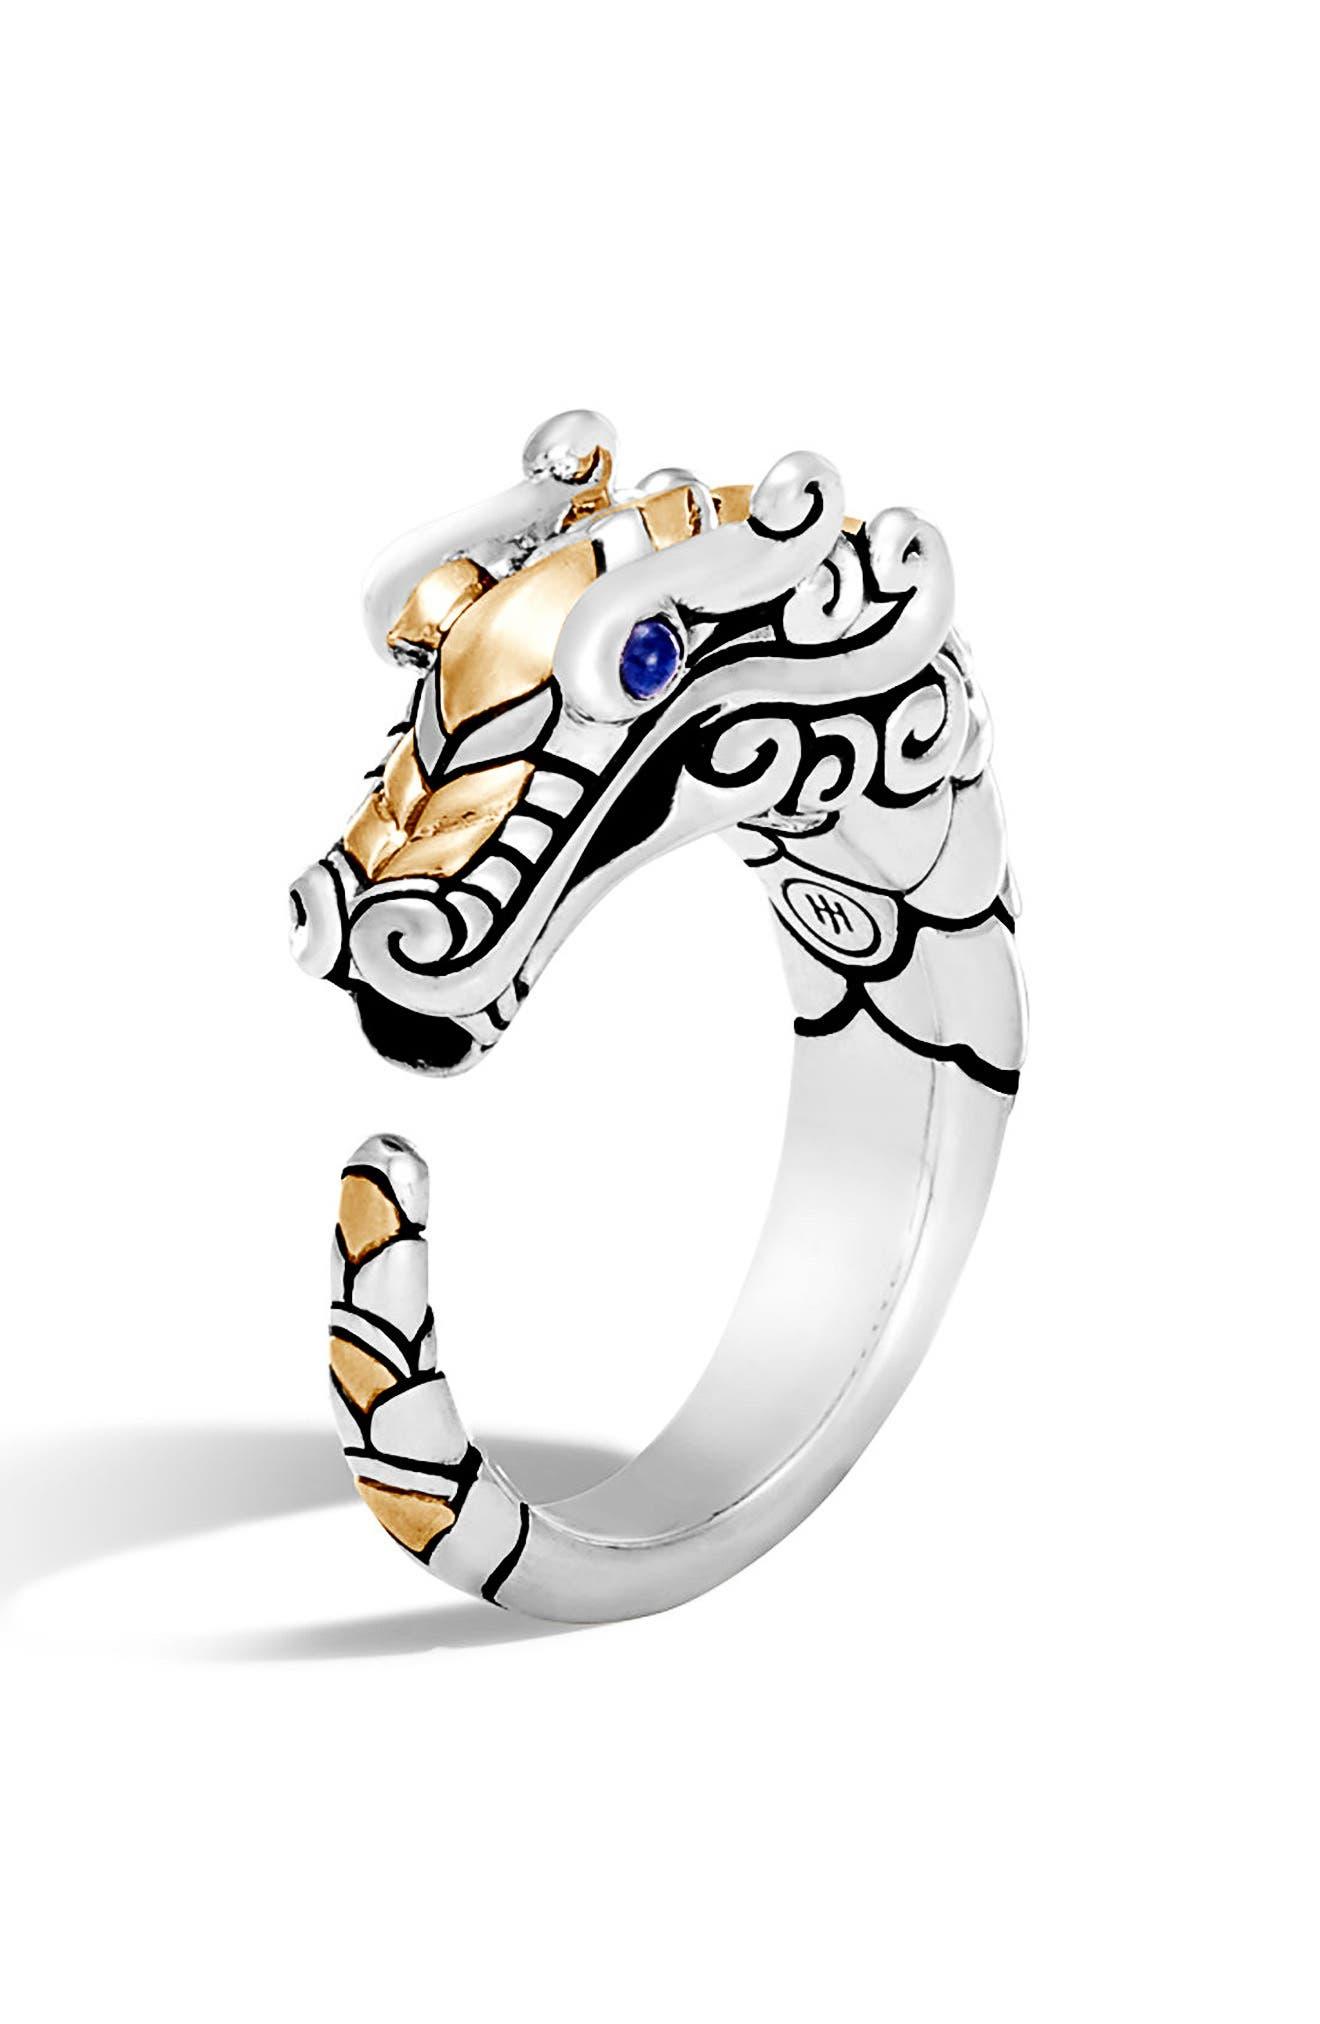 Main Image - John Hardy Legends Naga Ring